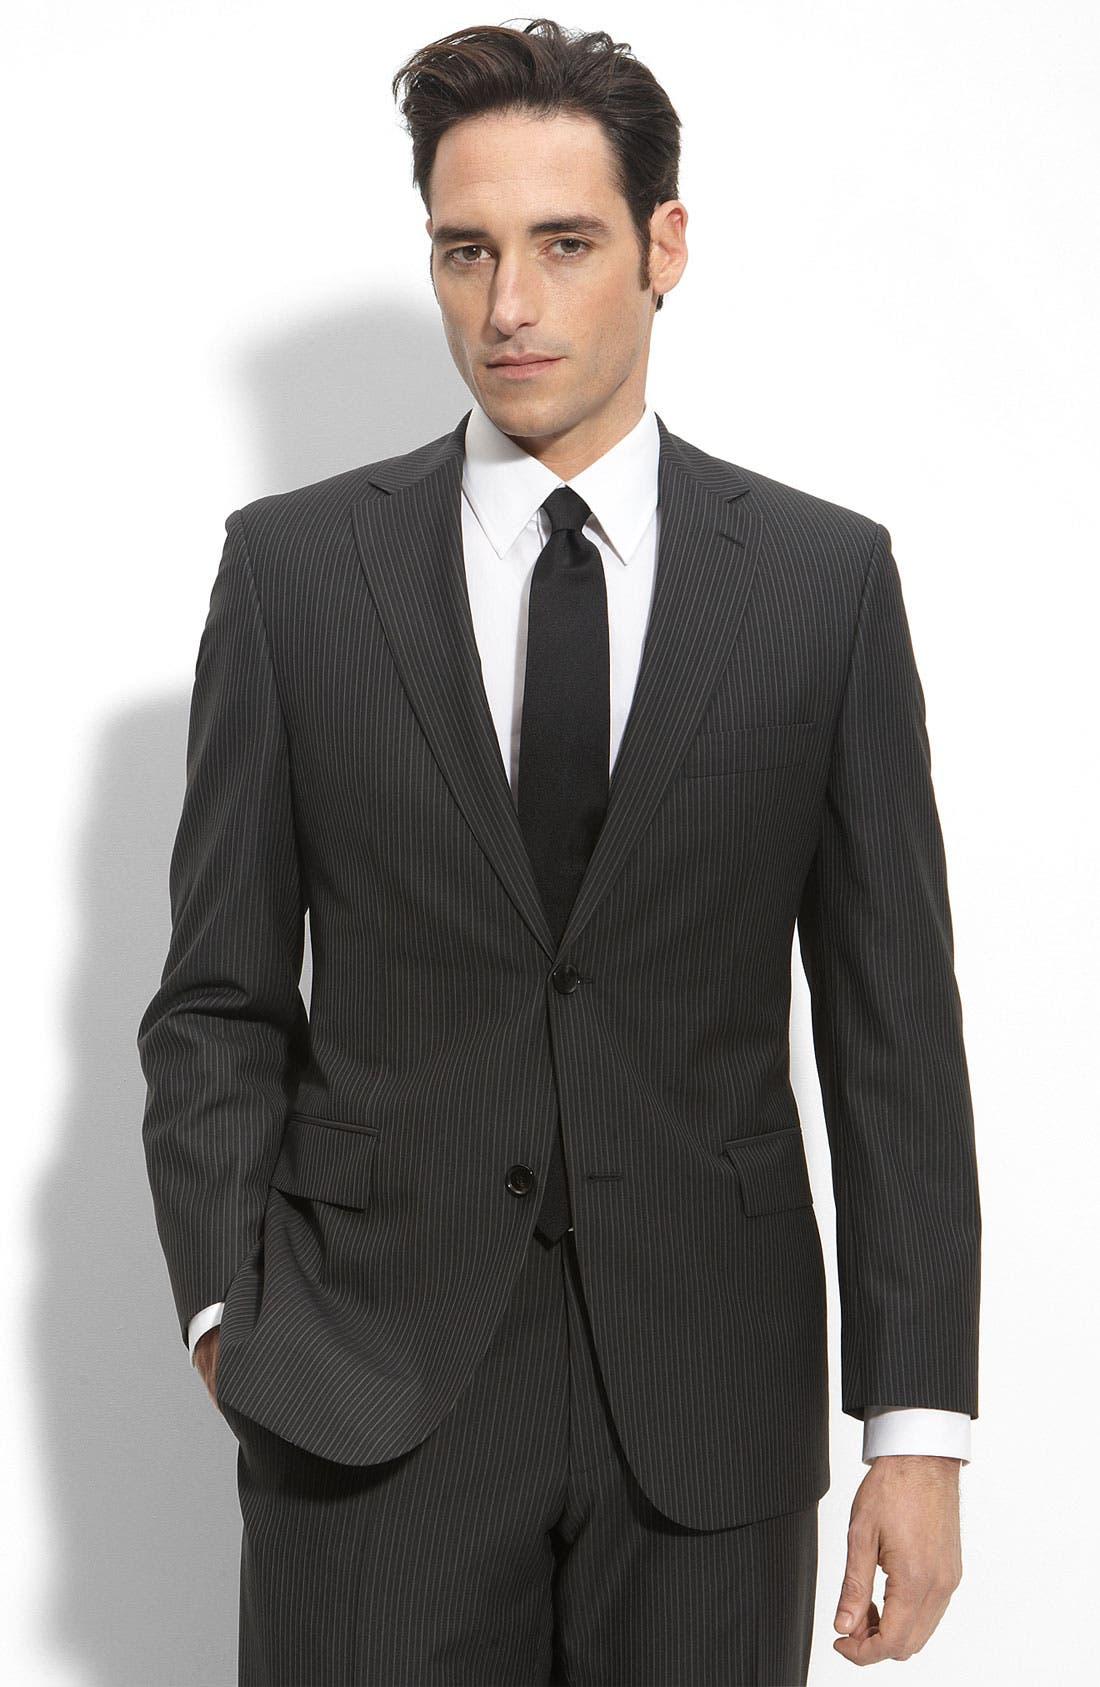 BOSS Black 'Pasolini/Movie' Charcoal Stripe Wool Suit,                             Main thumbnail 1, color,                             Charcoal Stripe